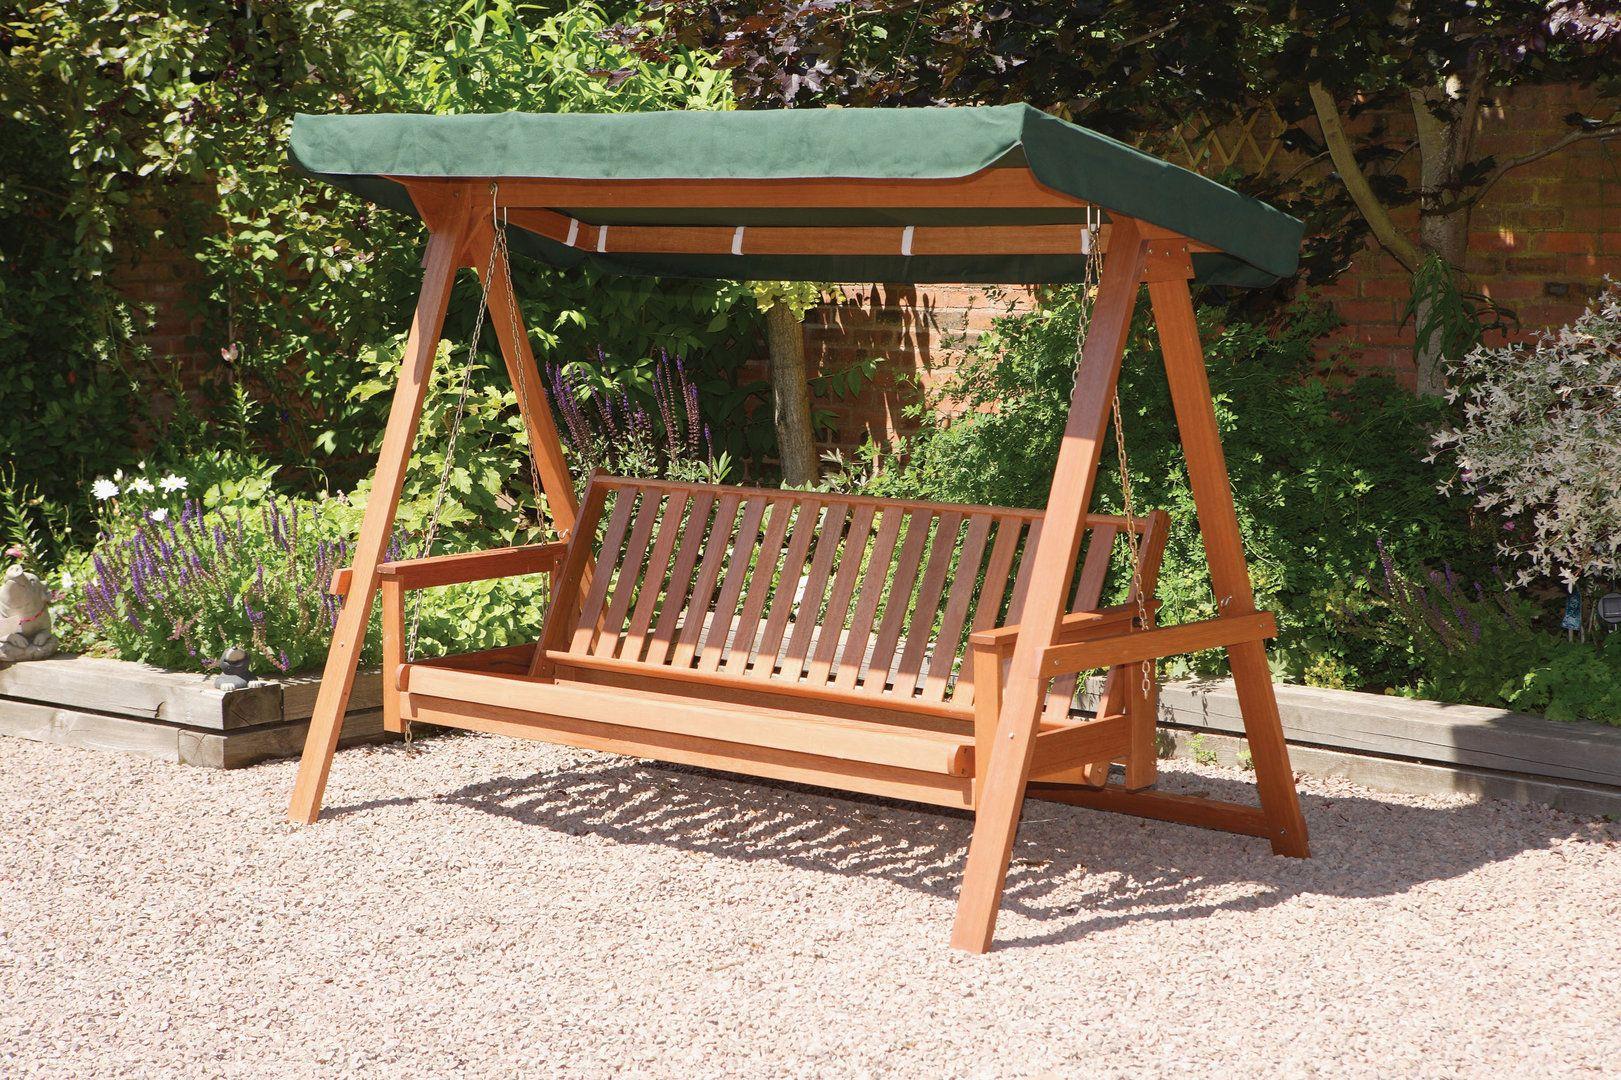 wooden swing hammock bzgtv outdoor. Black Bedroom Furniture Sets. Home Design Ideas